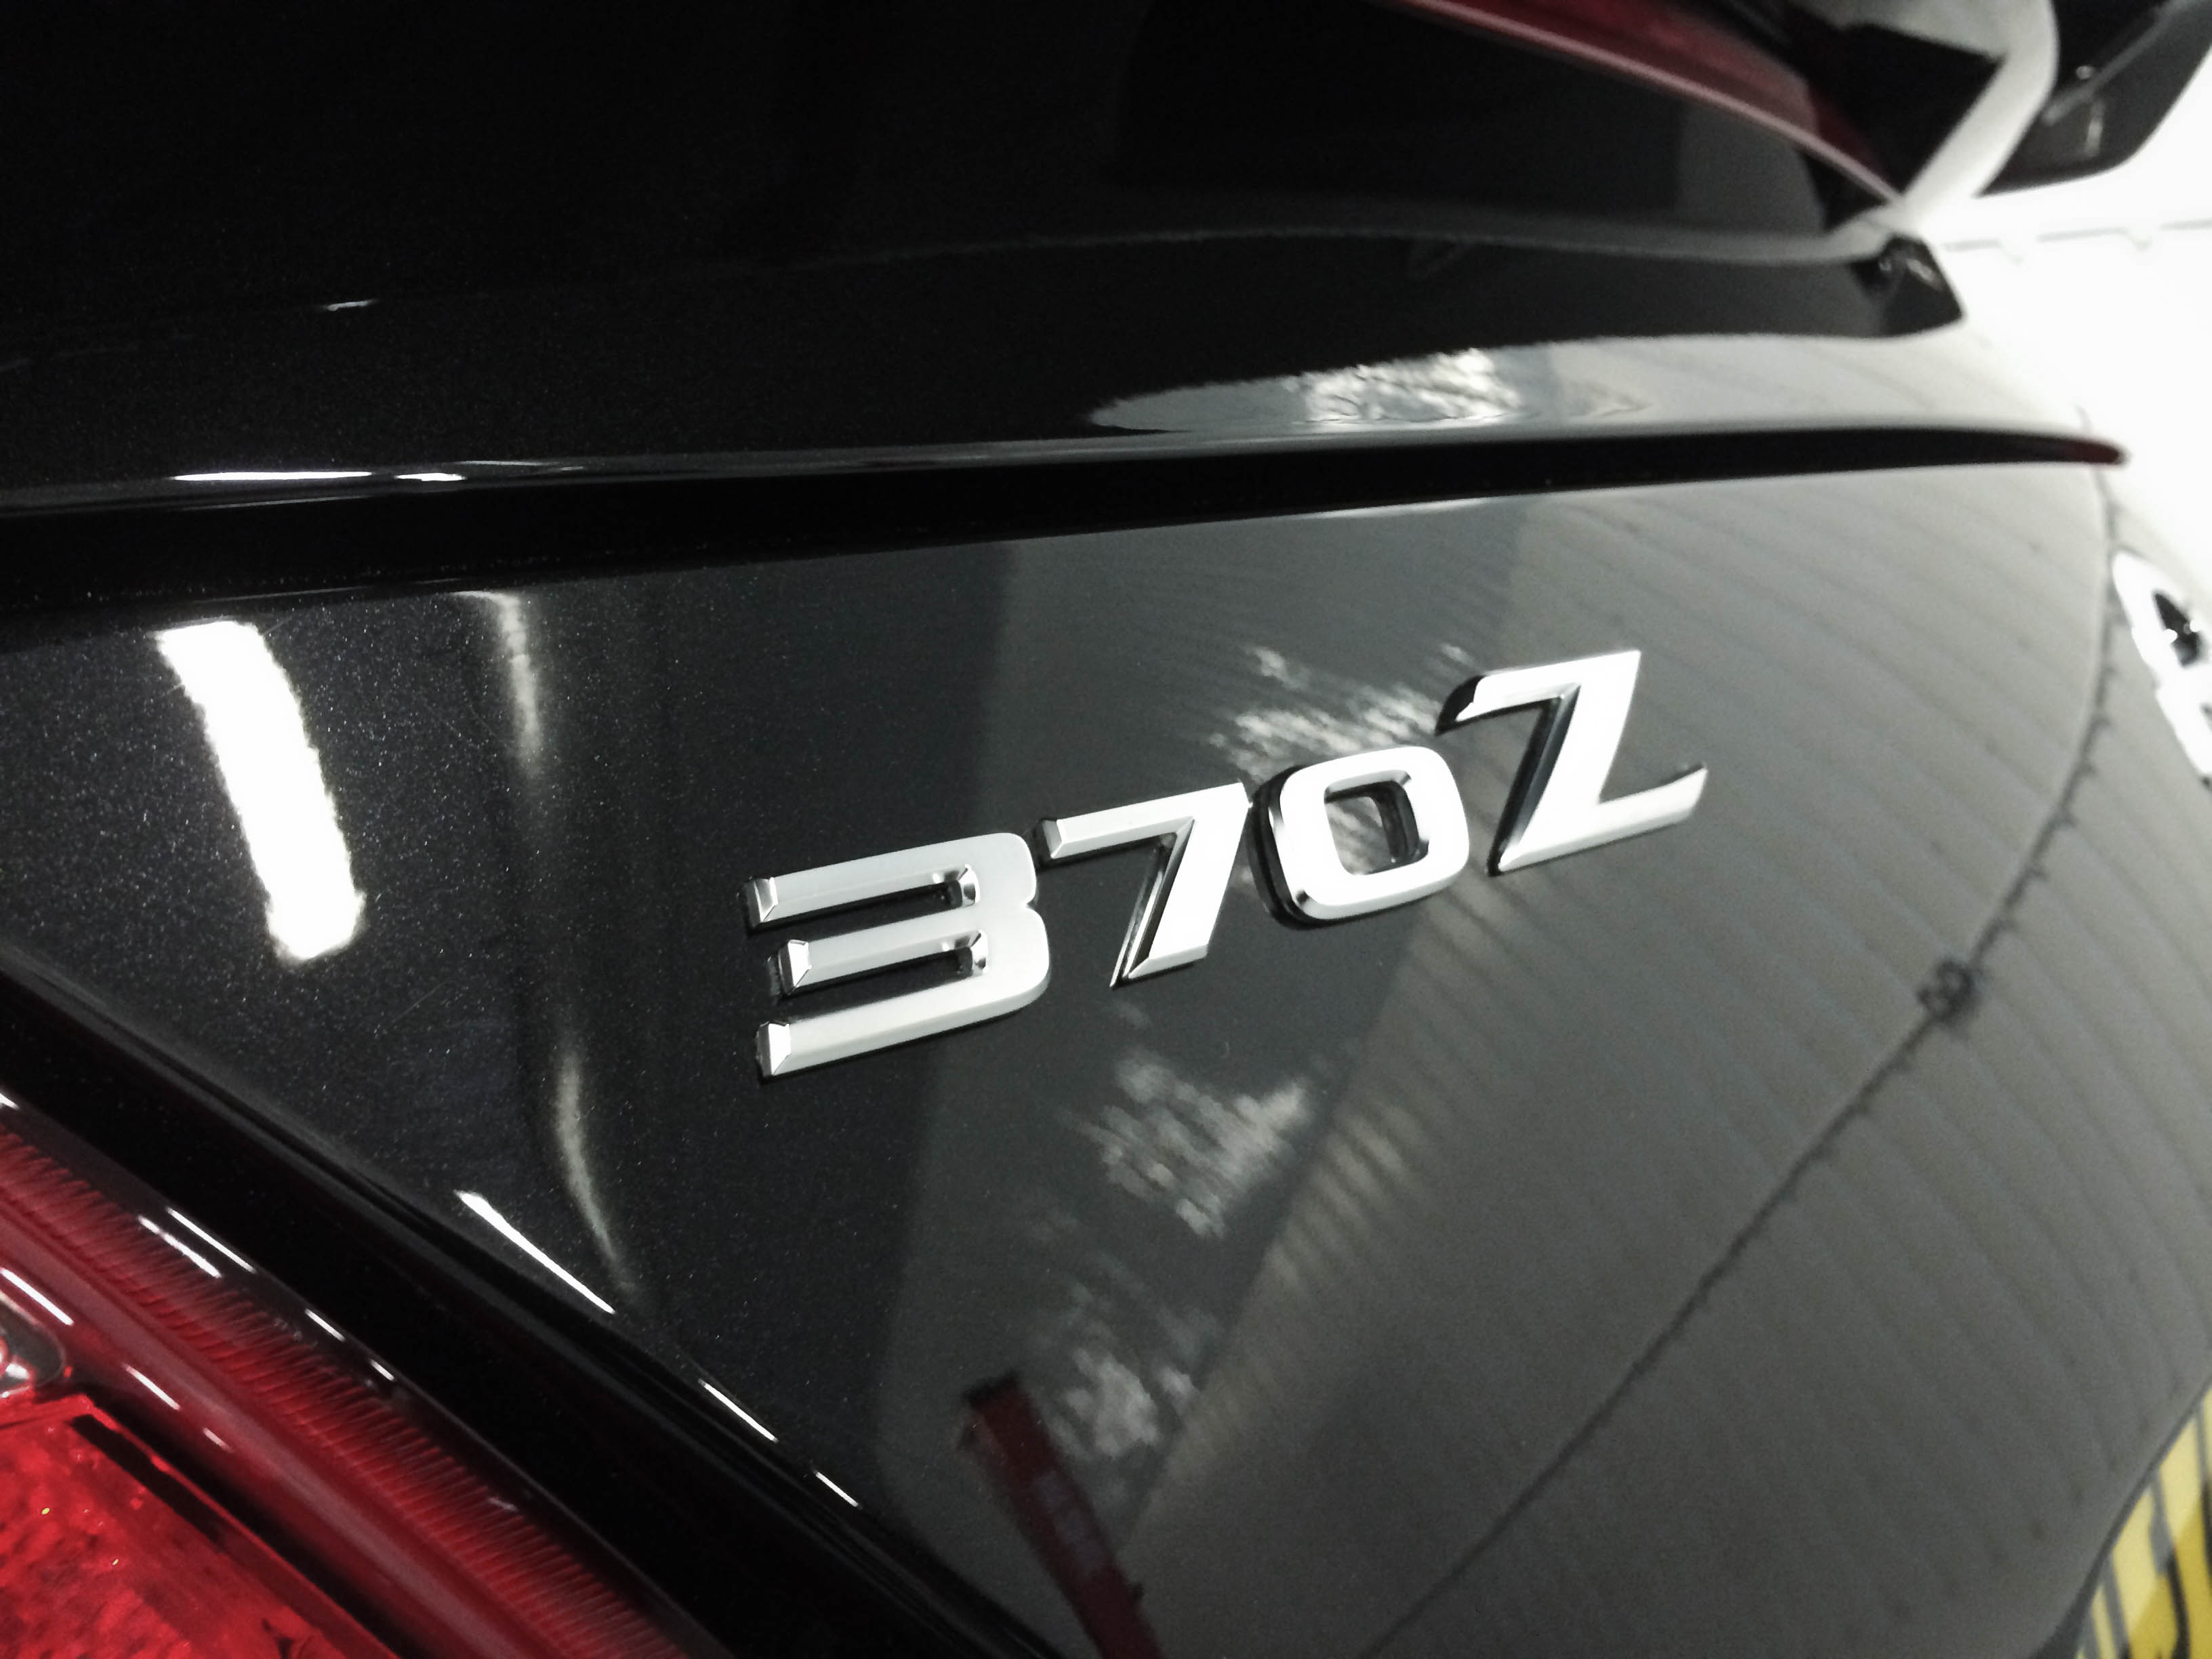 Nissan 370z Nismo –Rear badge